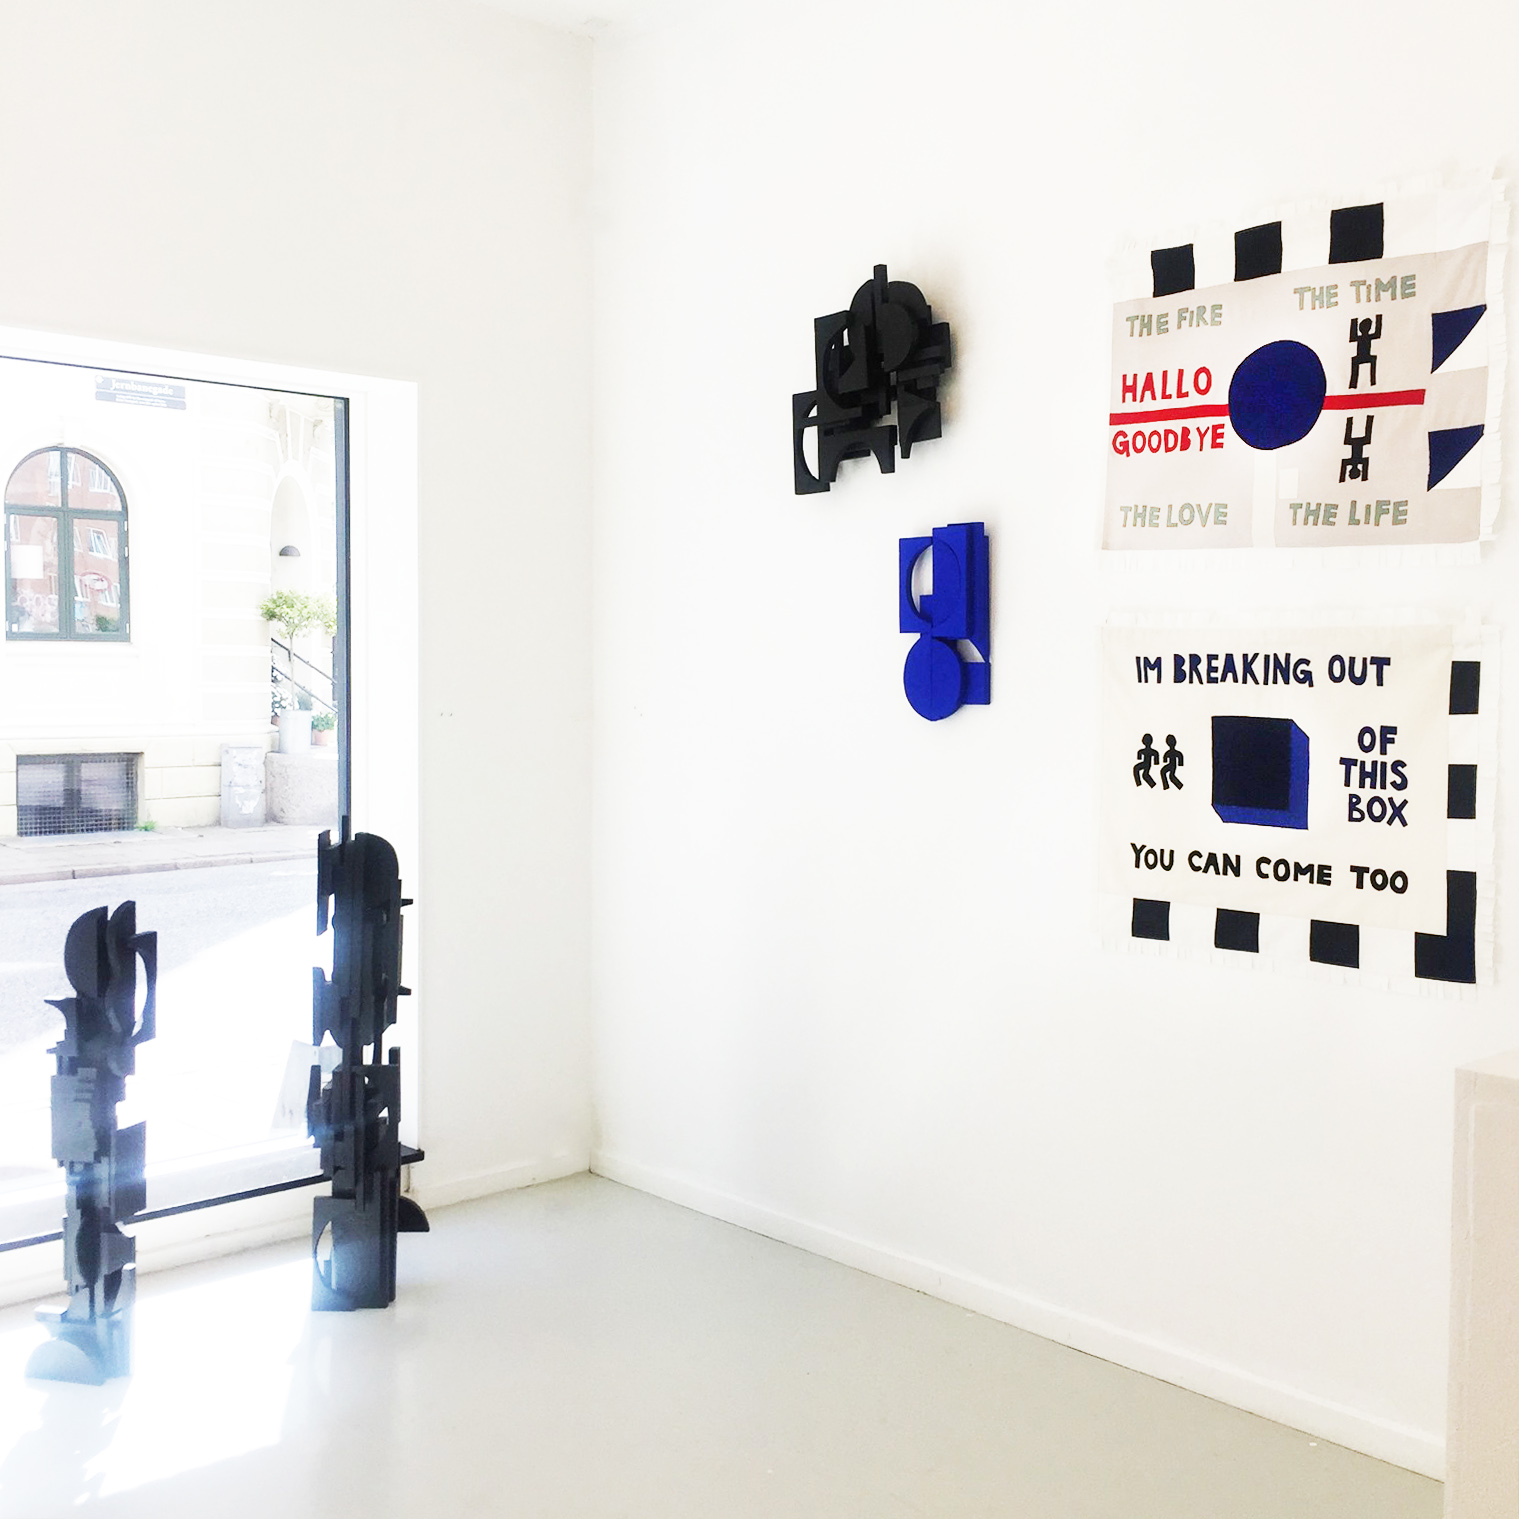 Væg Contemporary Art Gallery. Jernbanegade 20A. Aalborg DK. 2019